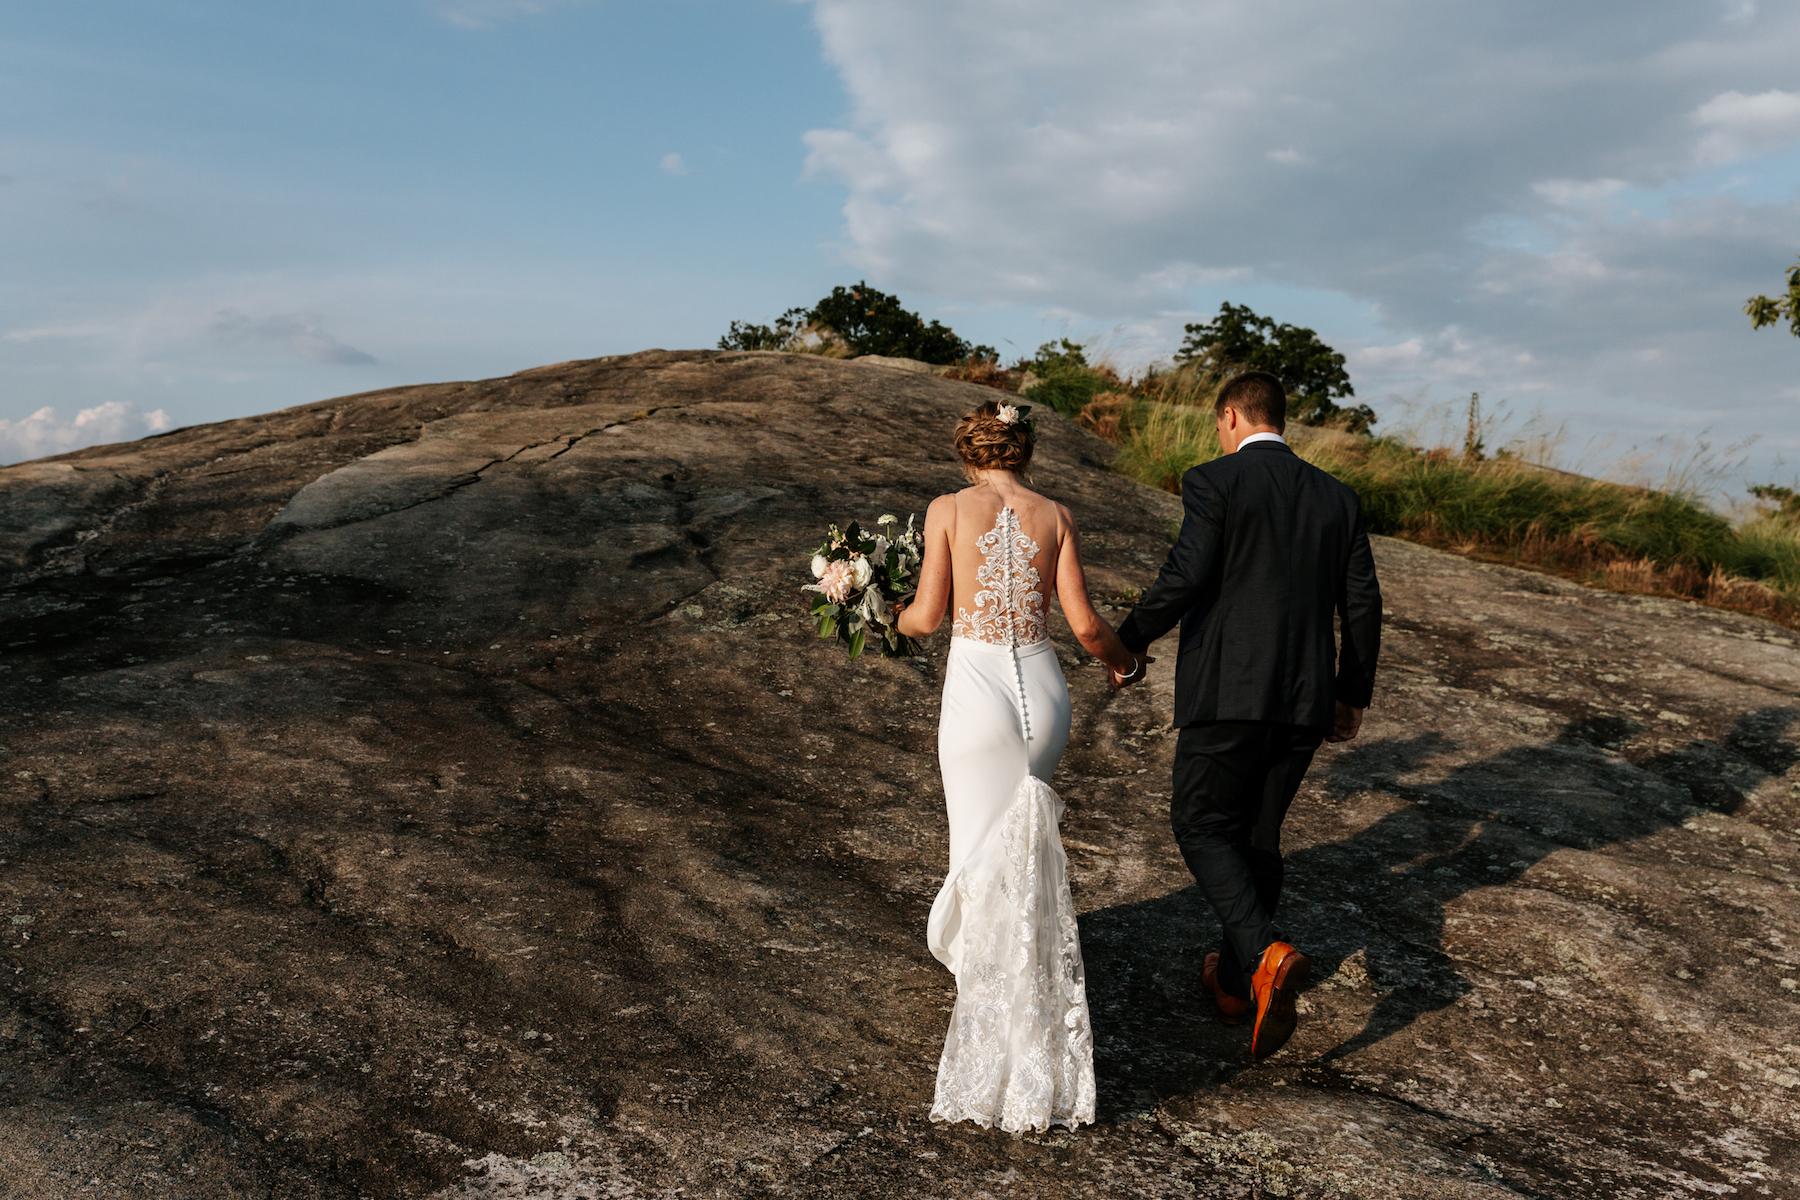 wedding-engagement-photographer-spartanburg-greenville-columbia-carolina-south-north-520.JPG